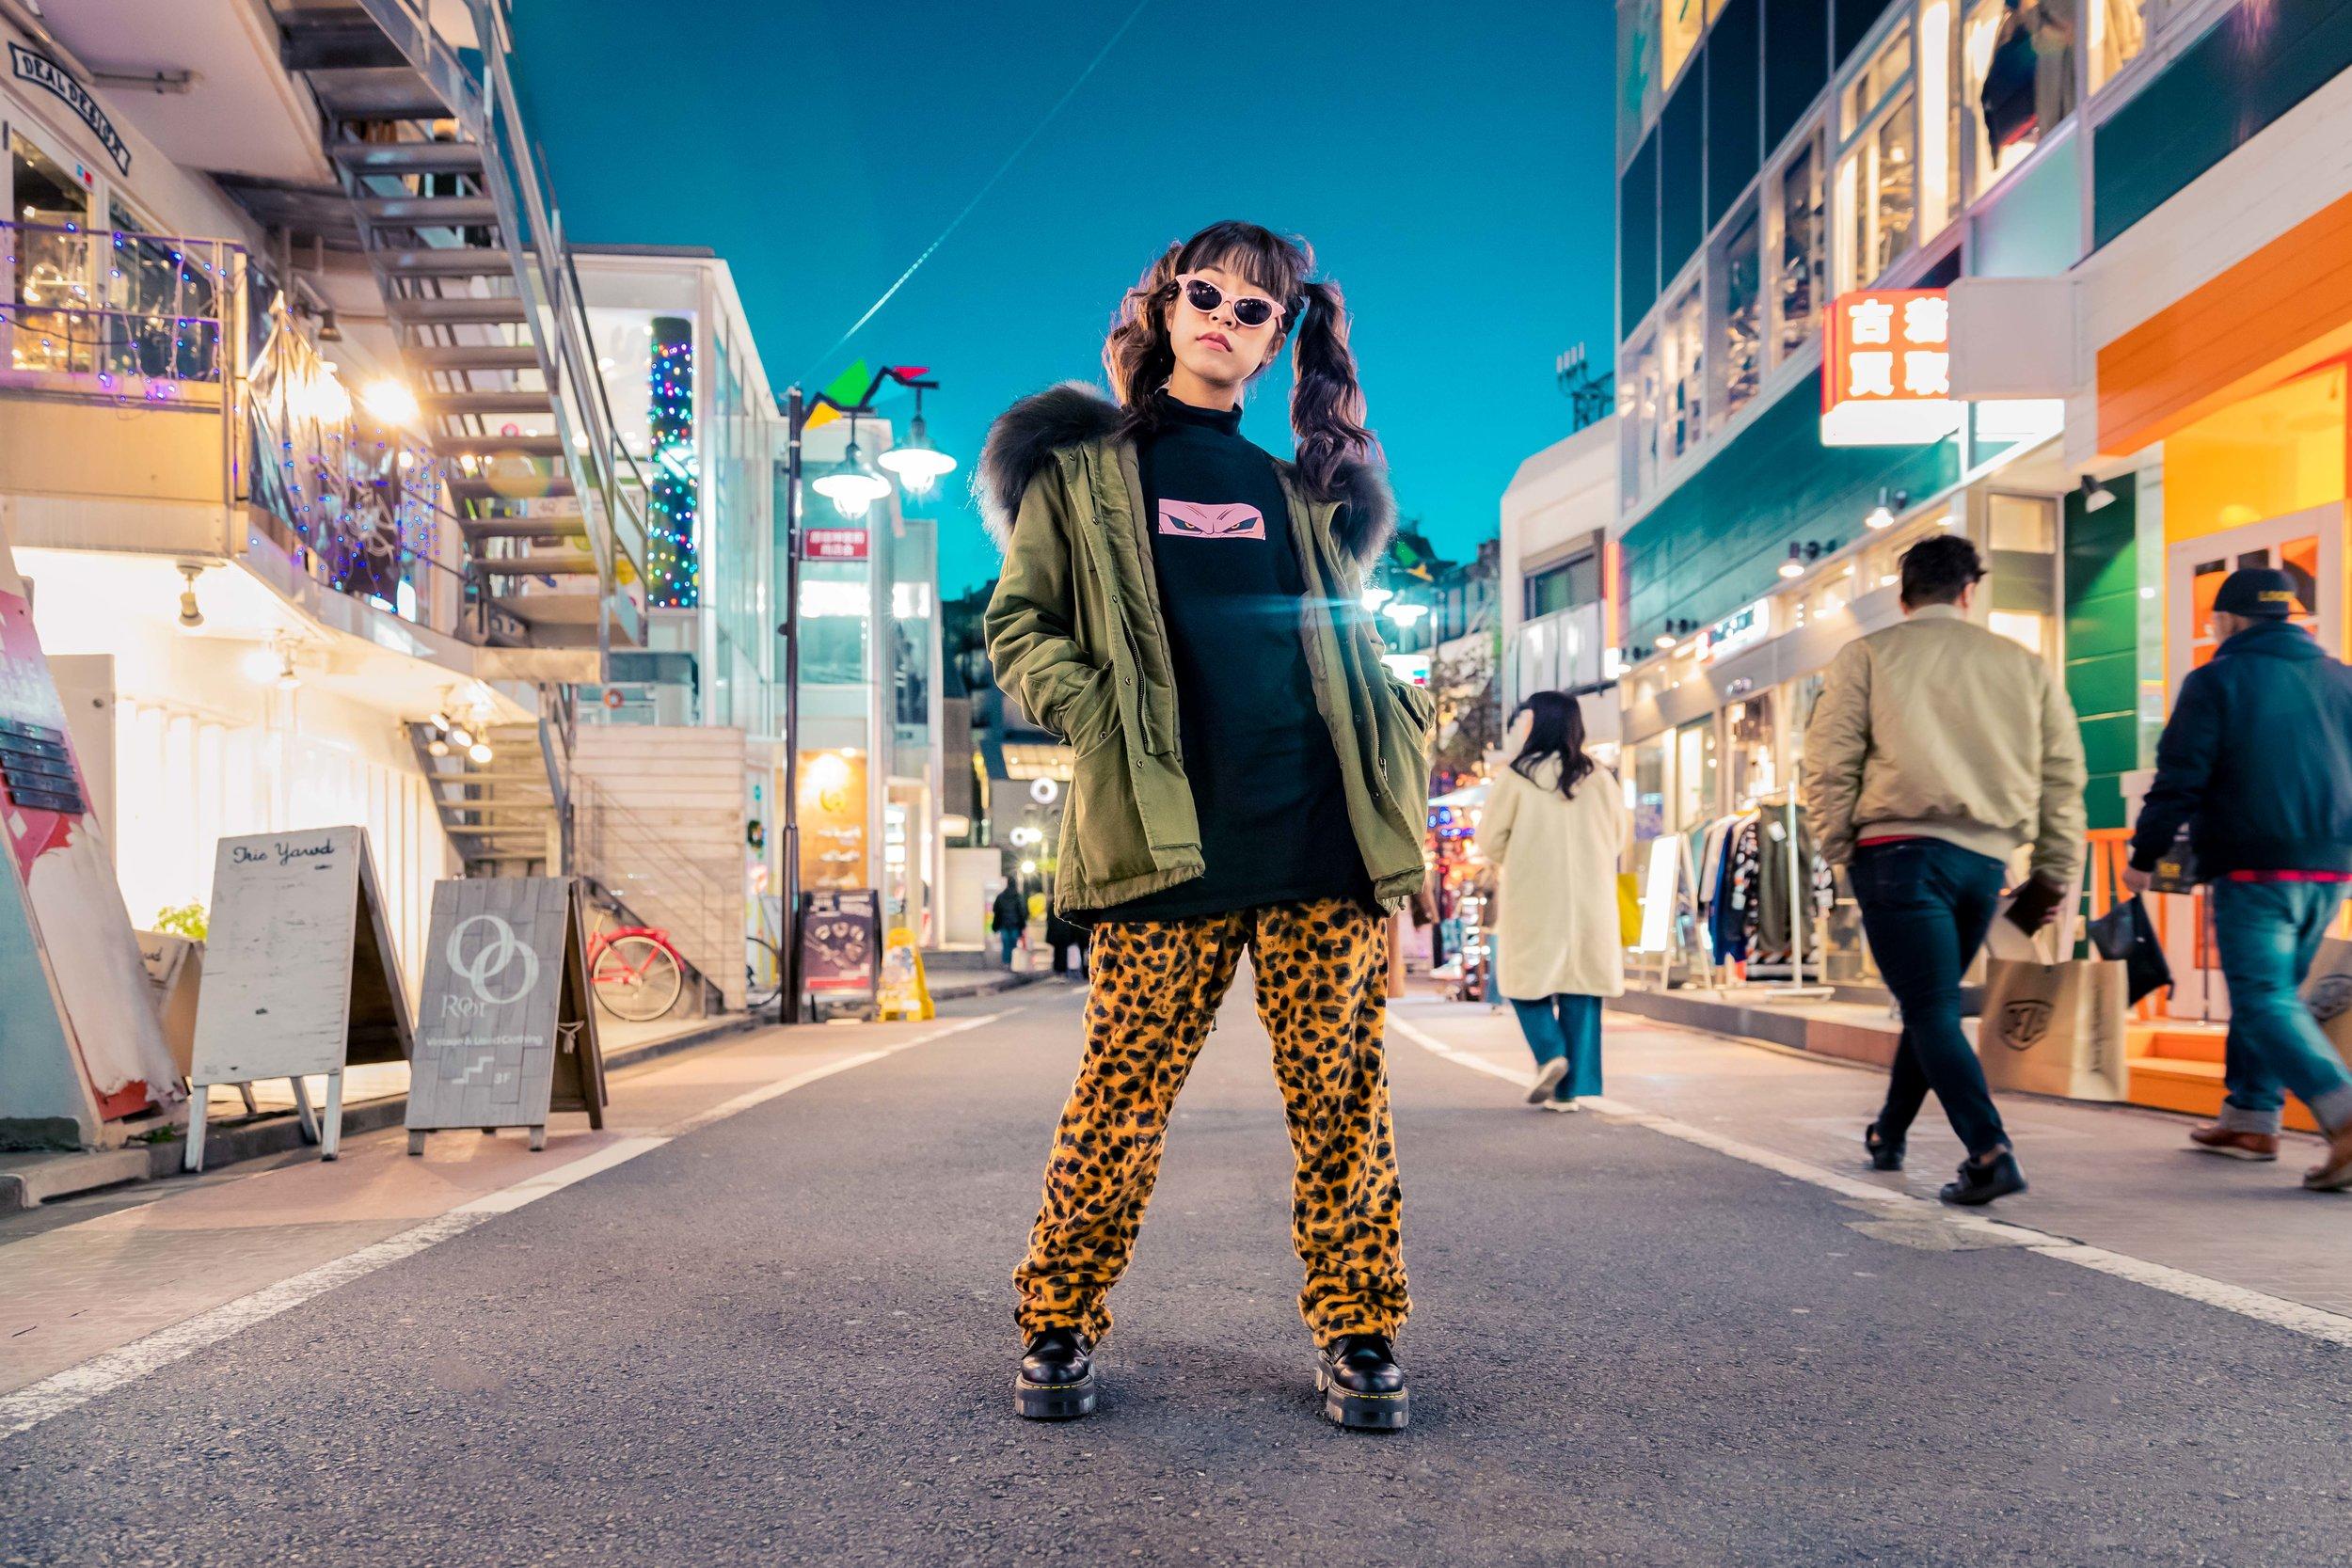 tokyo_street_photography_joshuachun.JPG